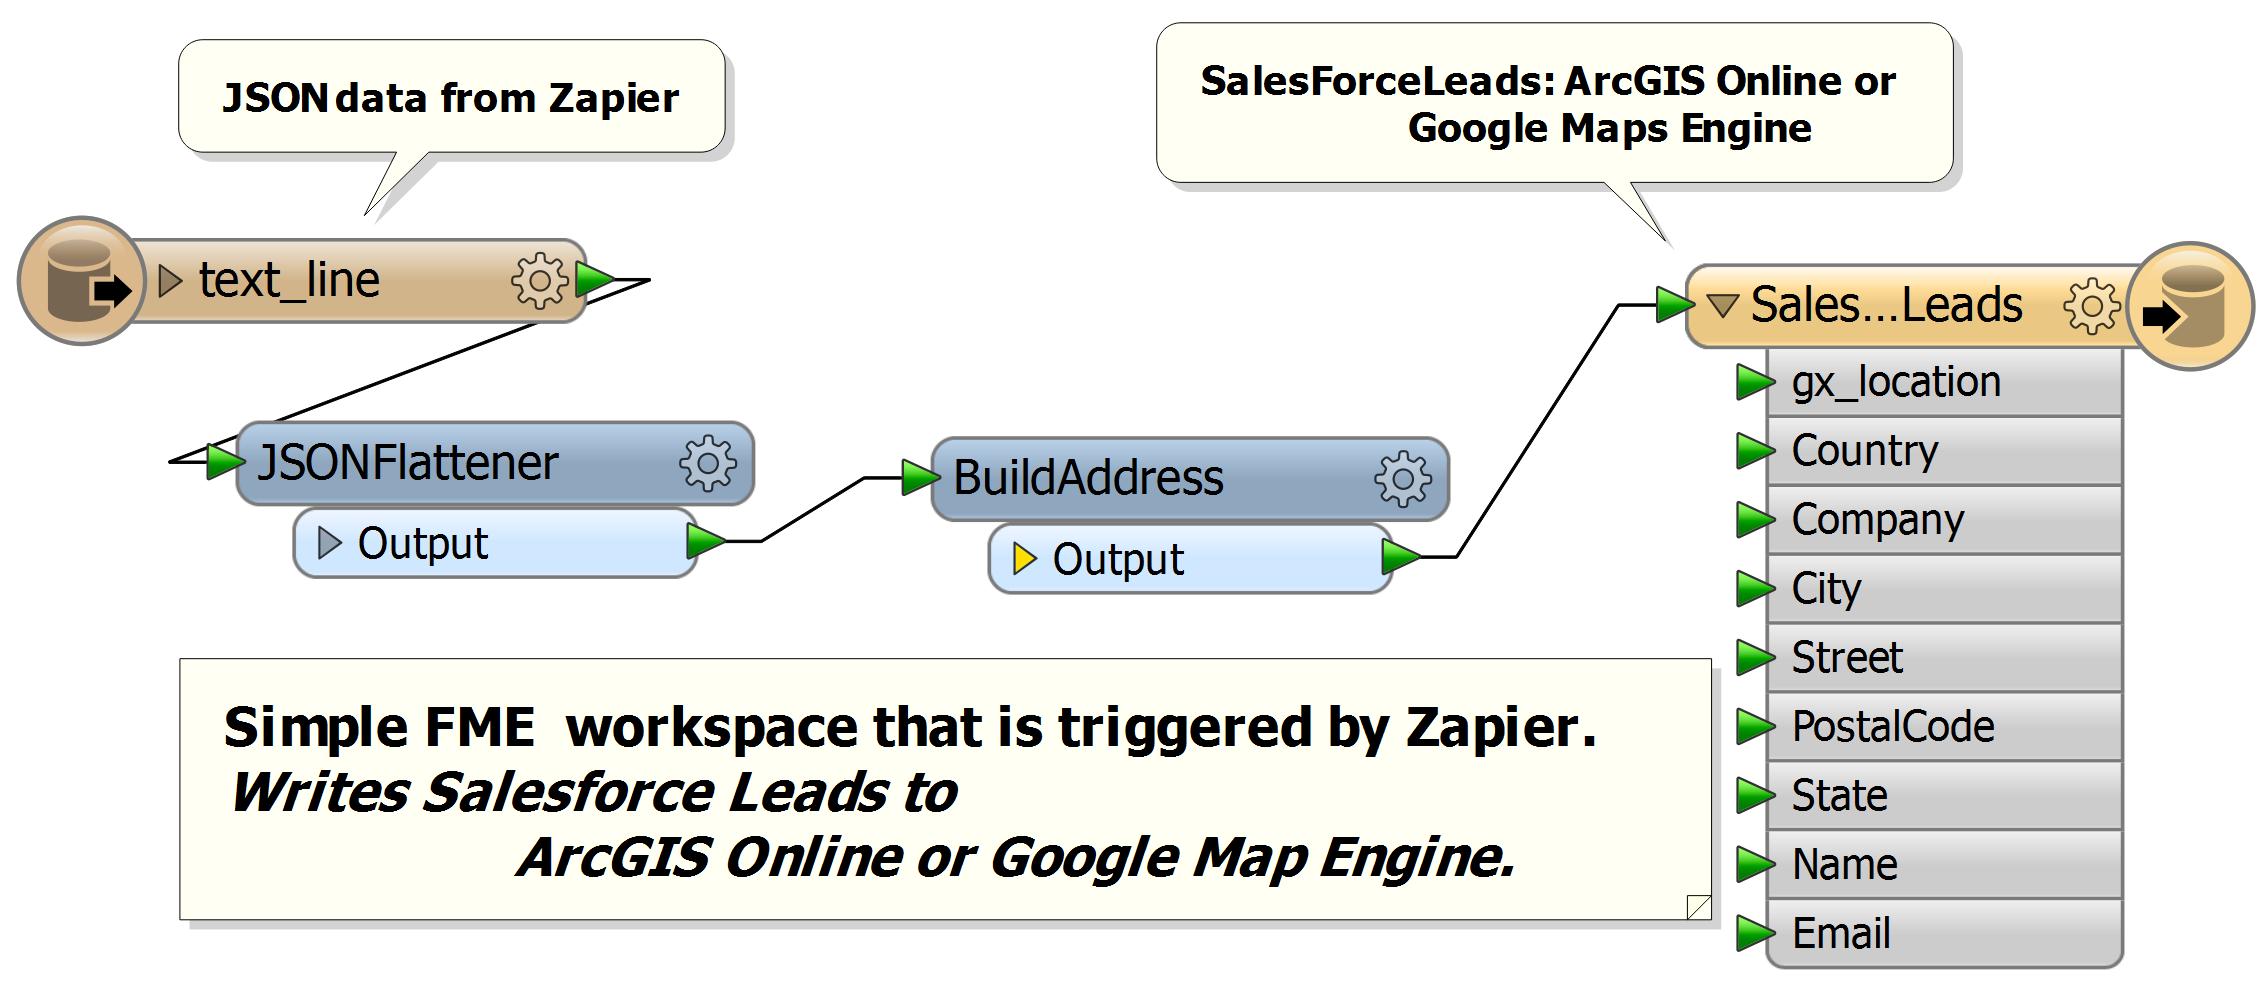 FME workspace - Salesforce to Google Maps Engine or ArcGIS Online